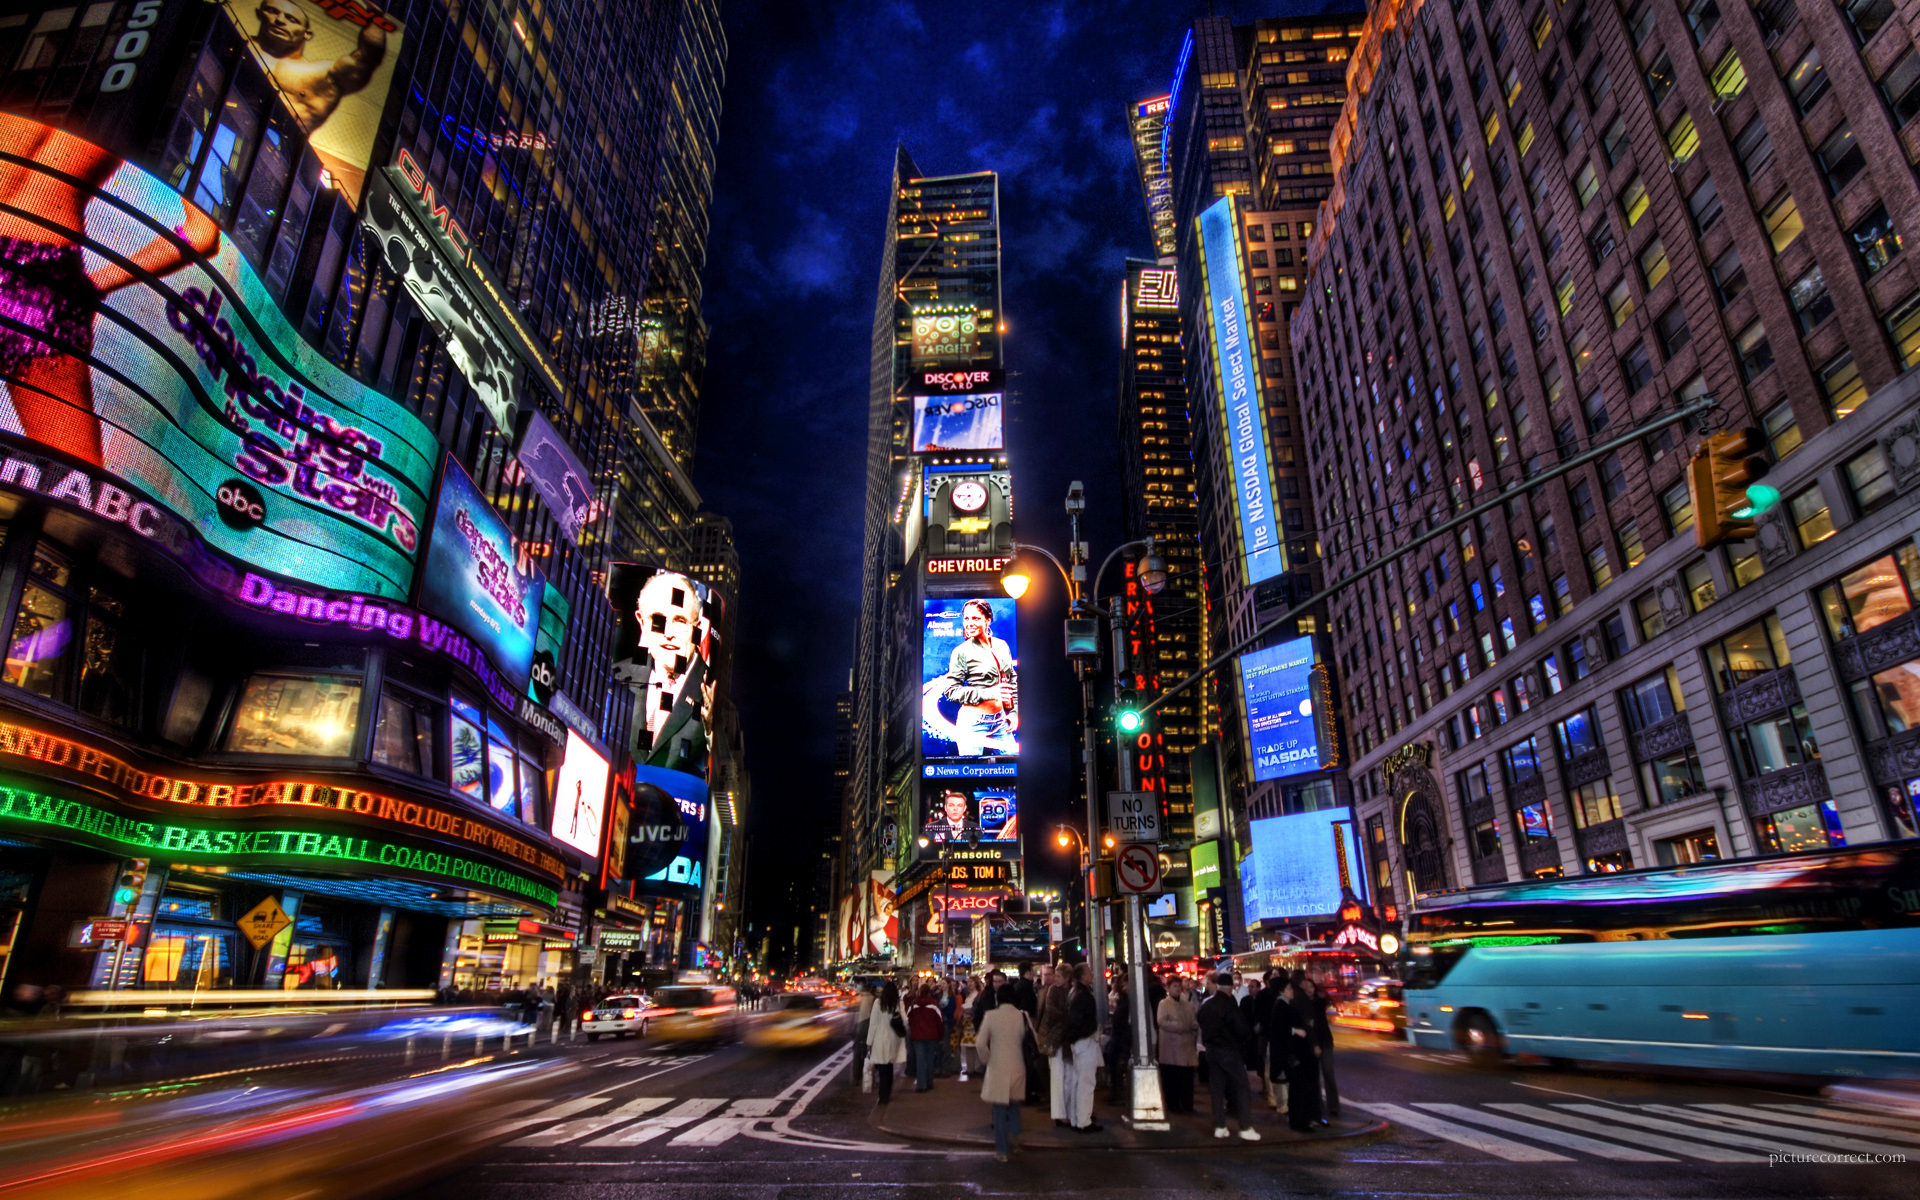 41 Times Square Hd Wallpaper On Wallpapersafari